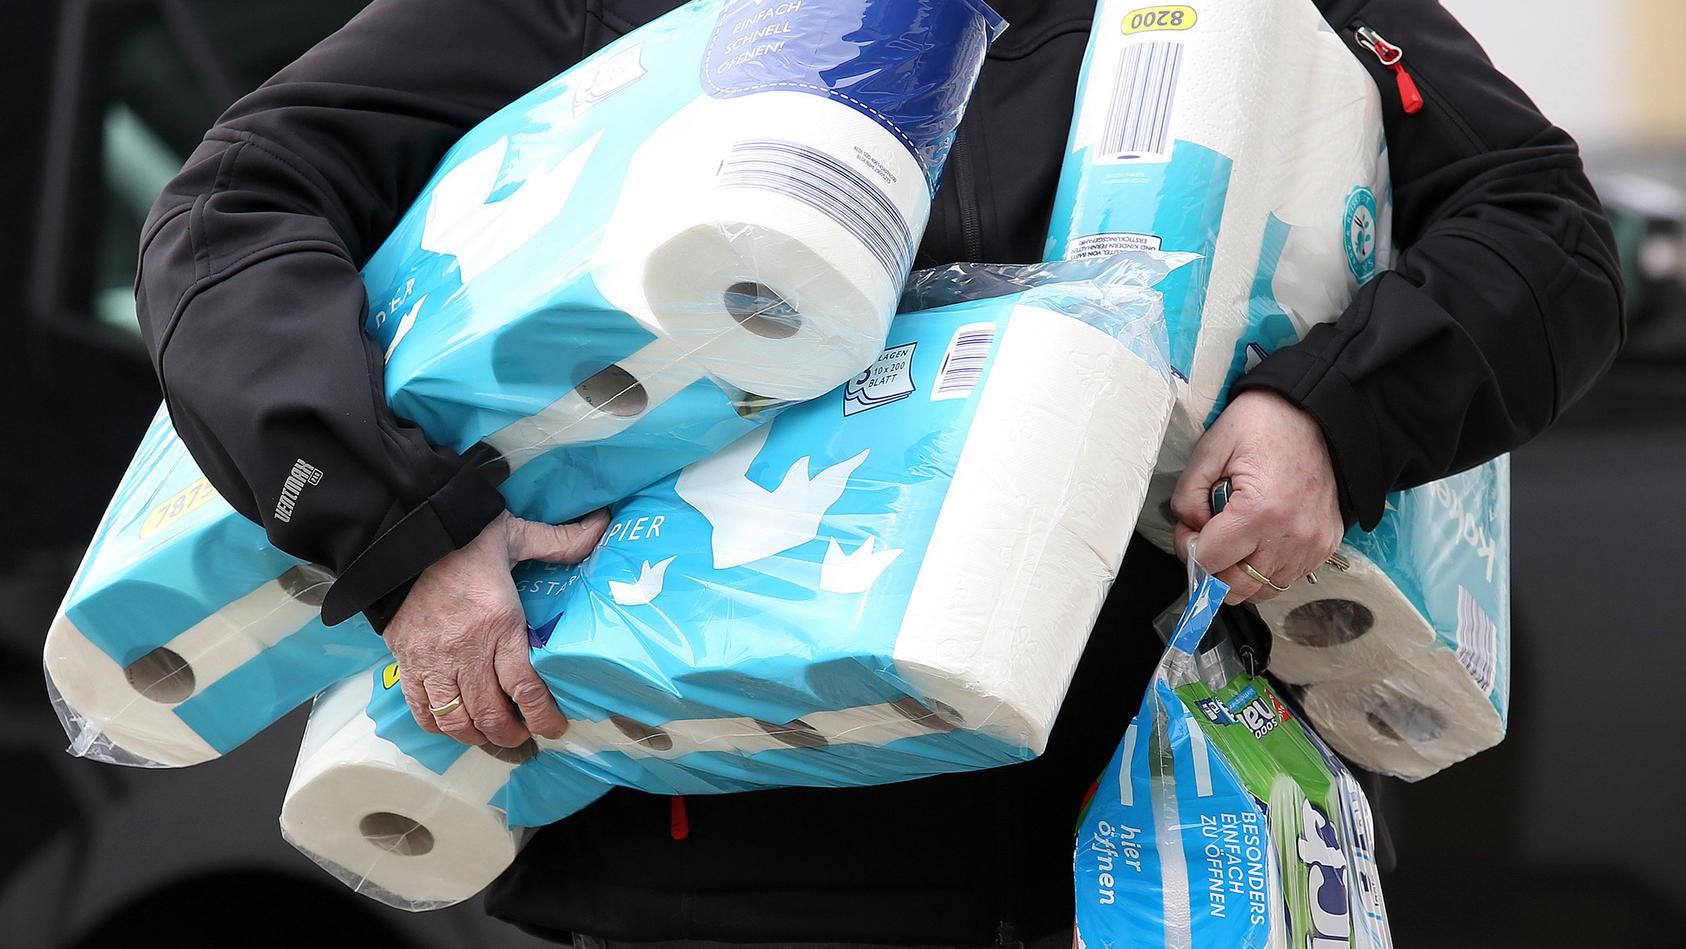 Papierbranche verkauft weniger Klopapier.